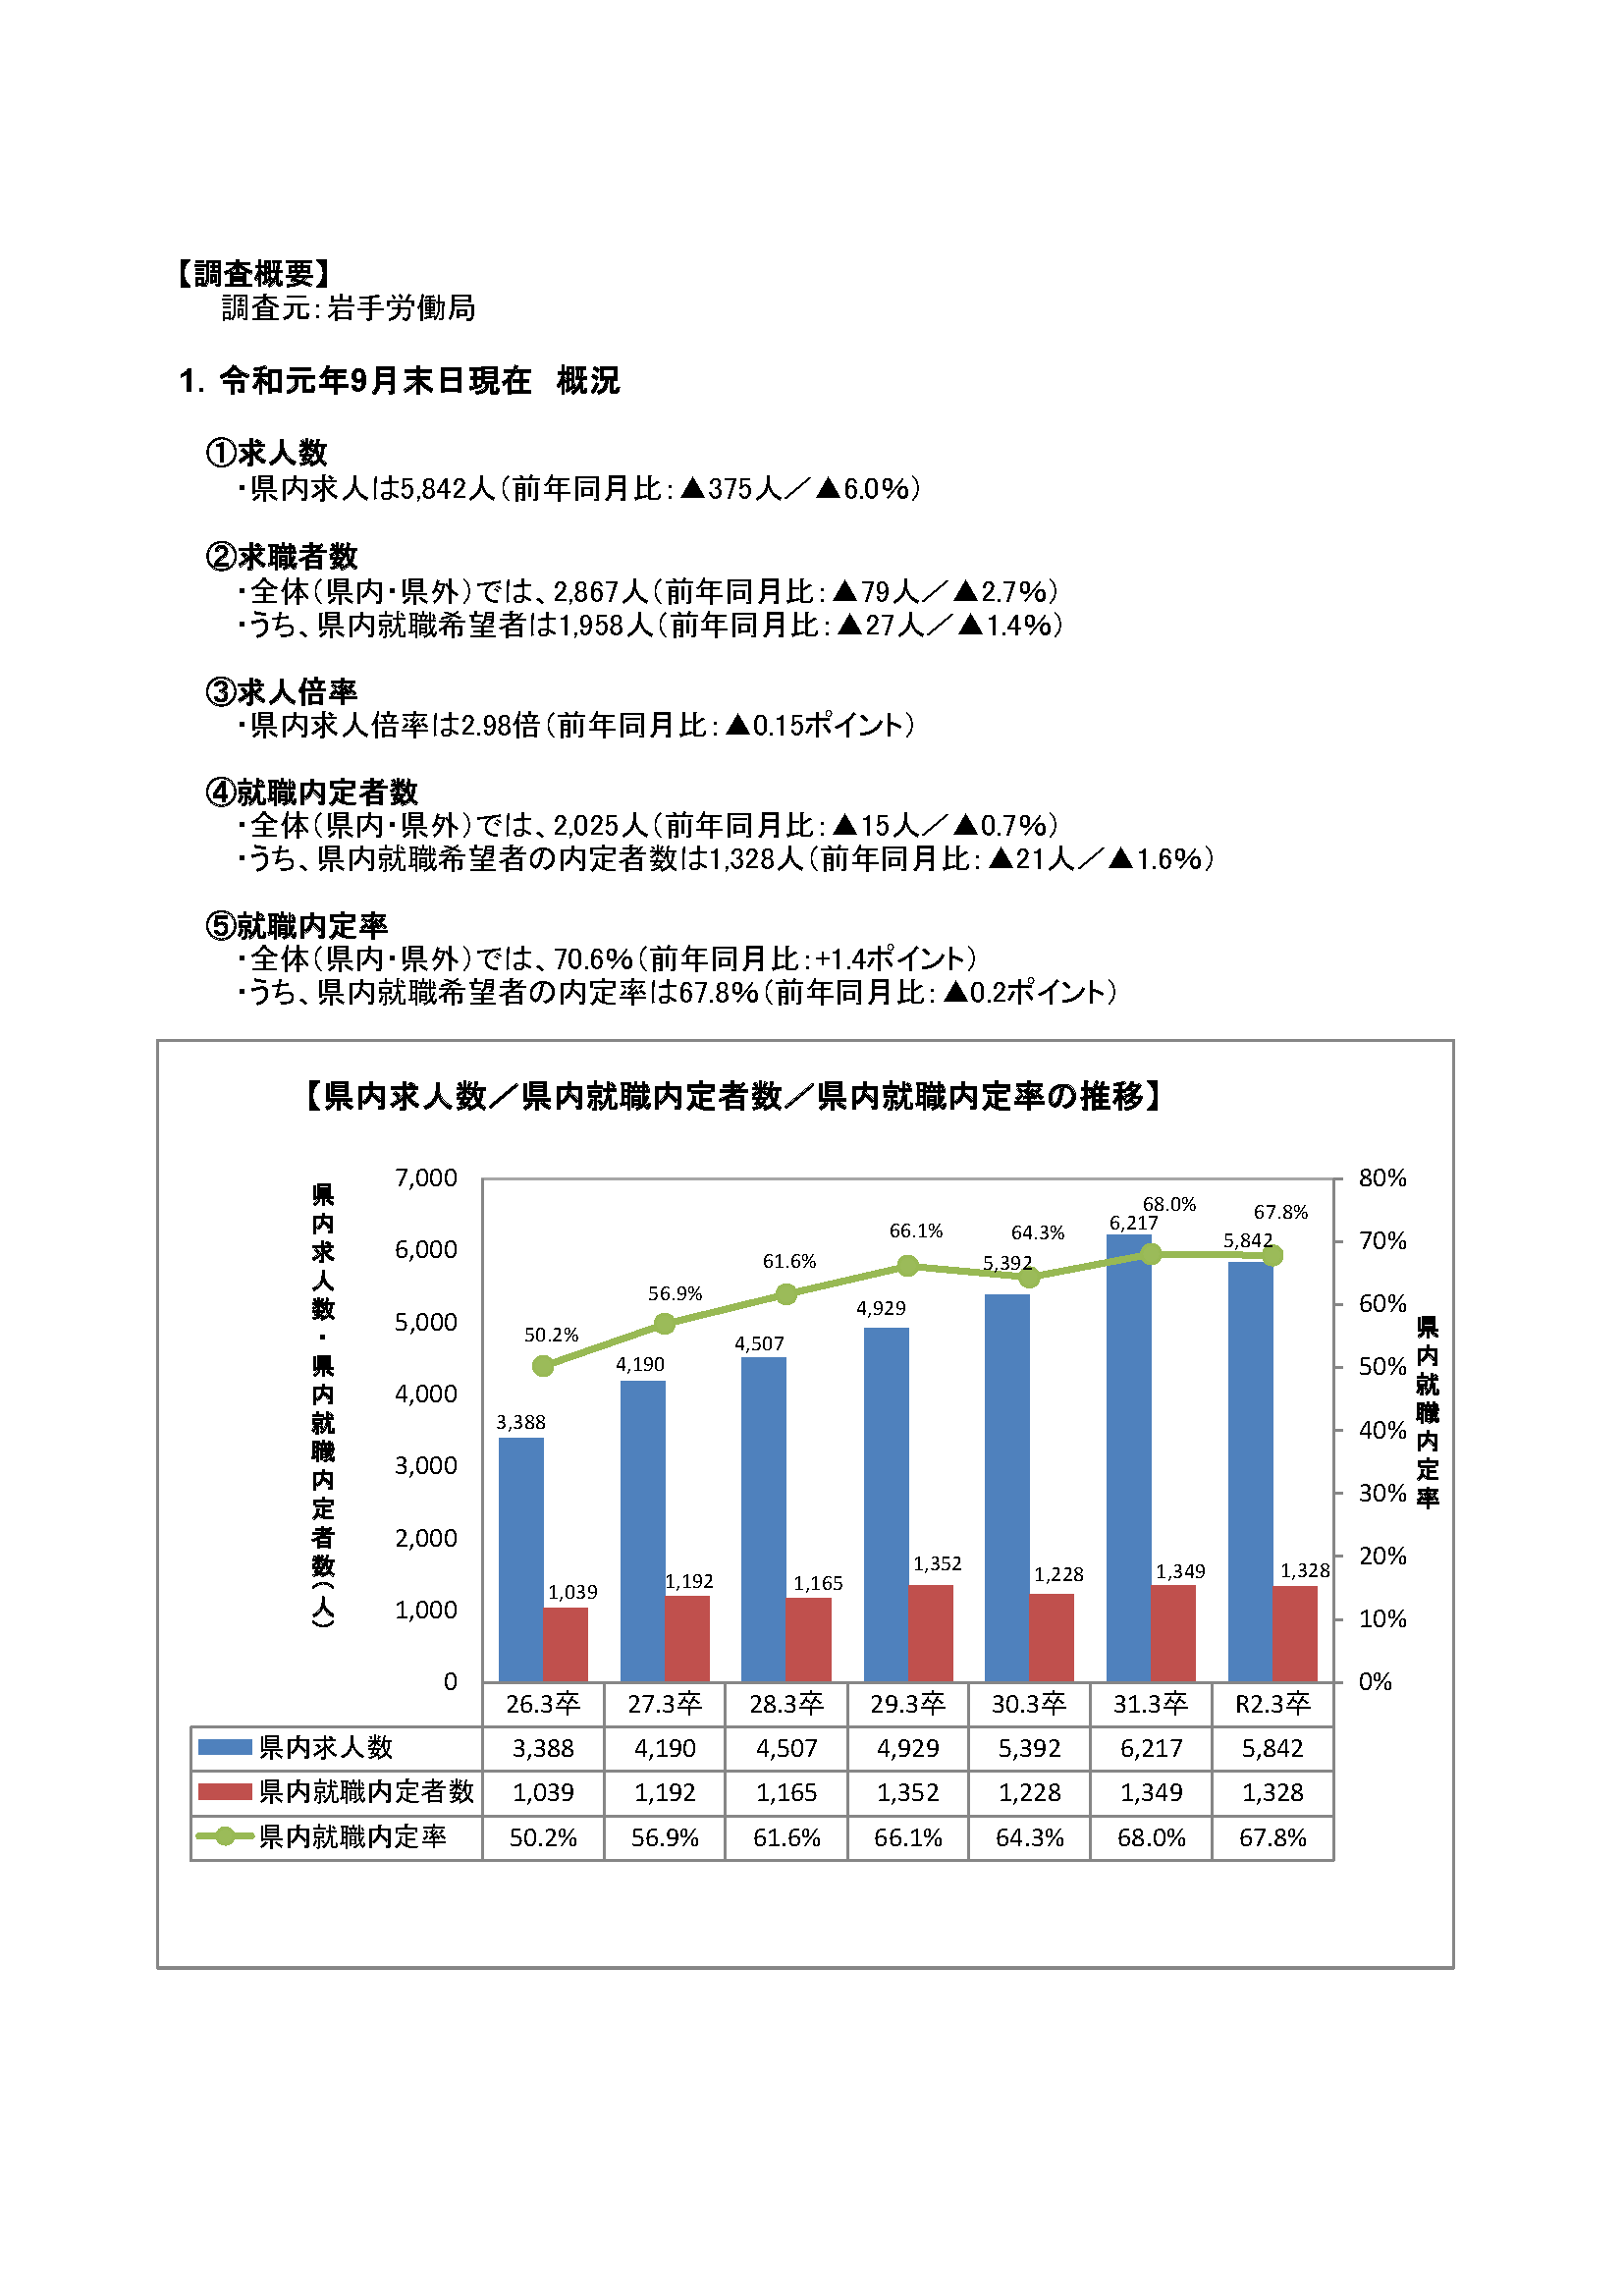 R2.3月高卒者職業紹介状況資料(201909月末現在)